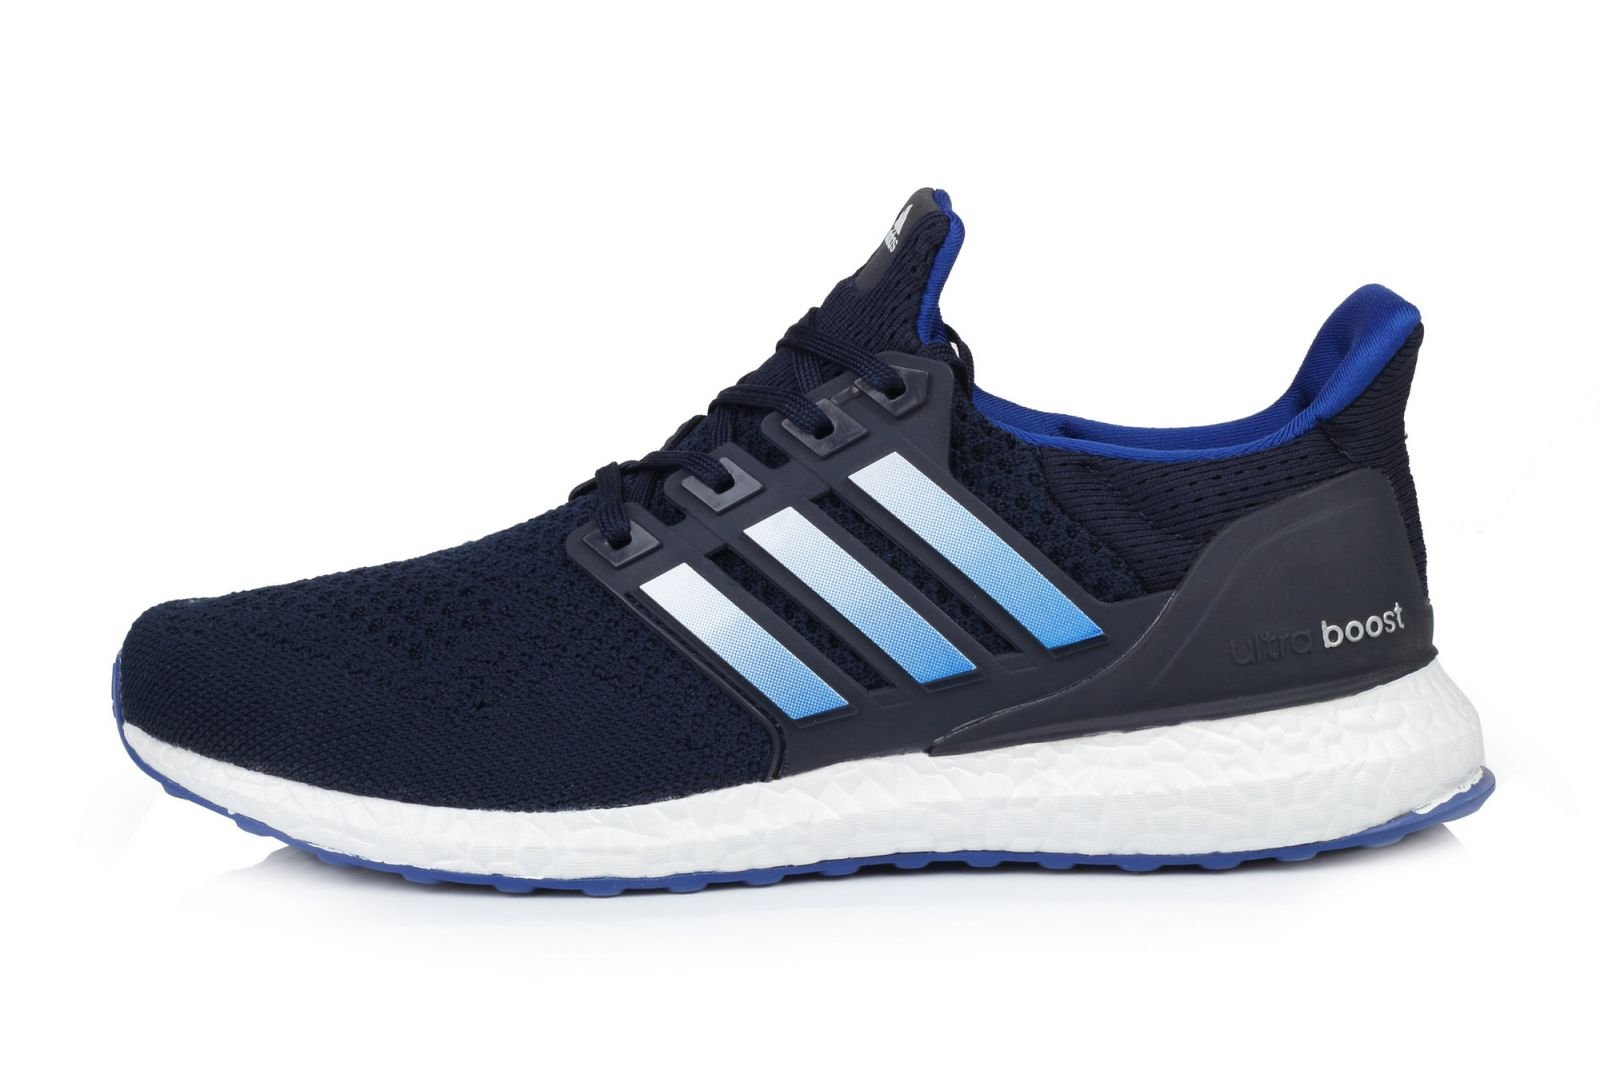 50b0106b Adidas Ultra Boost FutureCraft 3D Grey Blue, купить обувь Адидас в ...